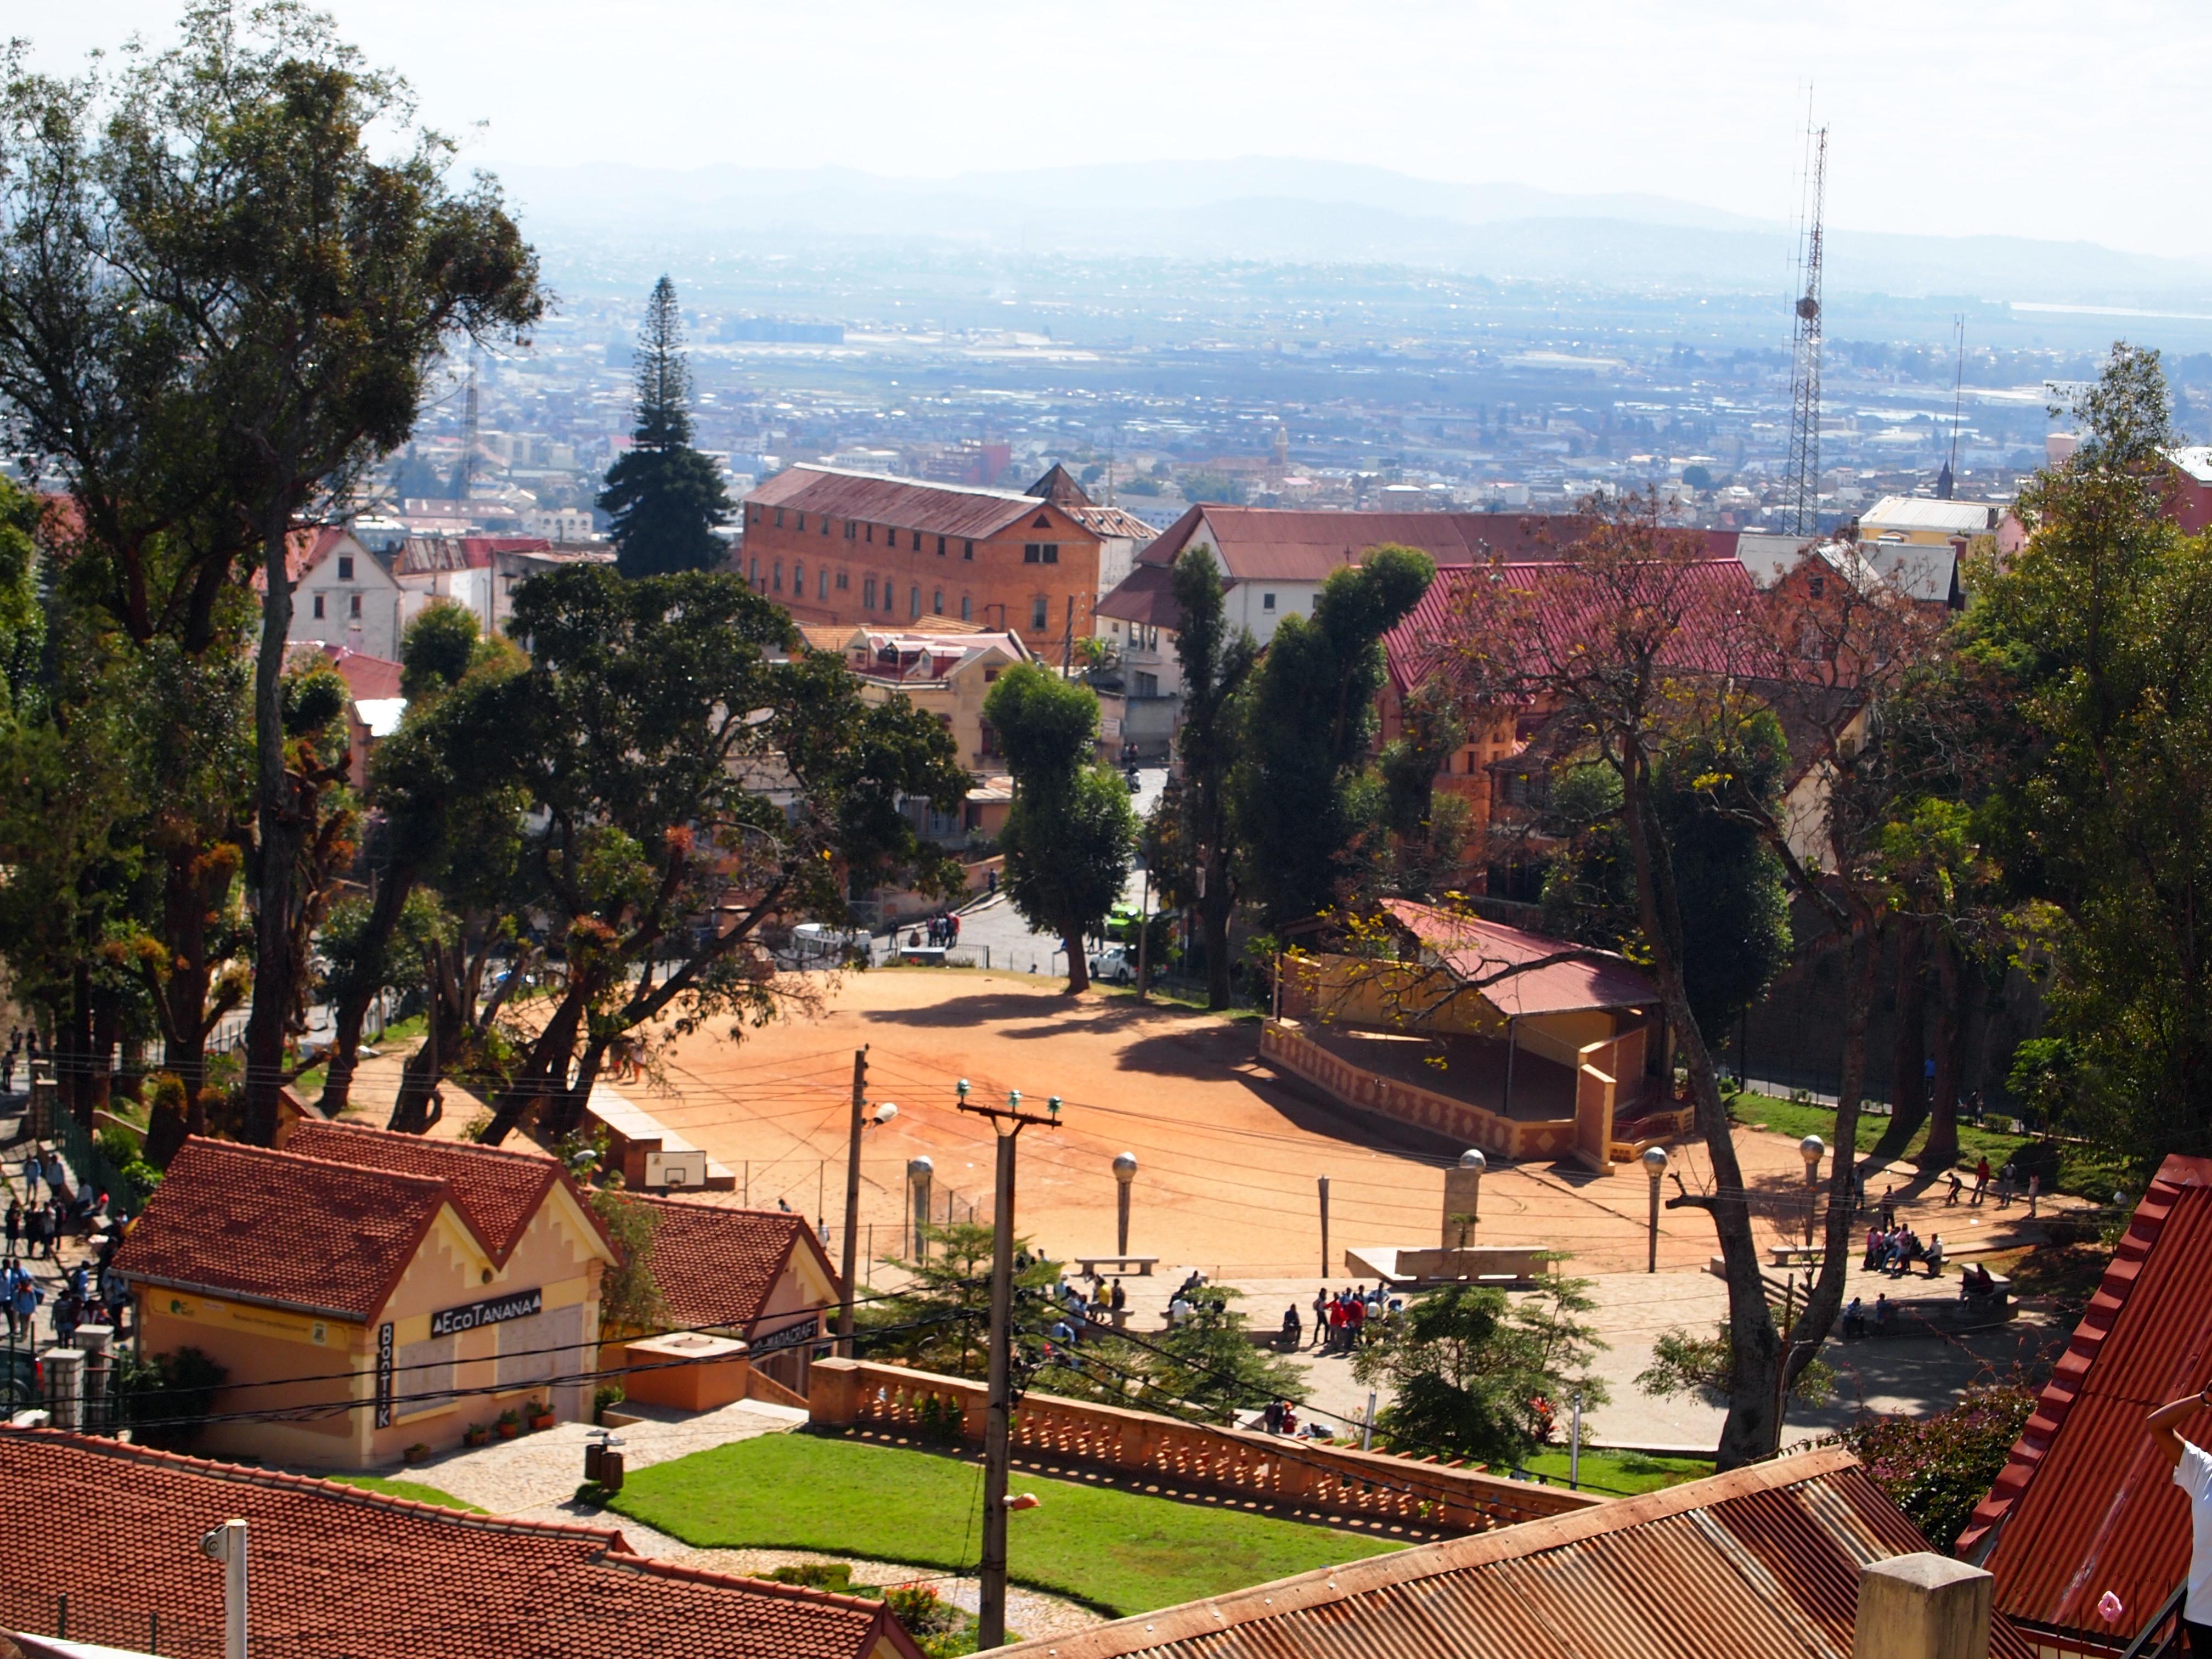 File:Antananarivo Madagascar andohalo plaza.JPG ... - photo#20